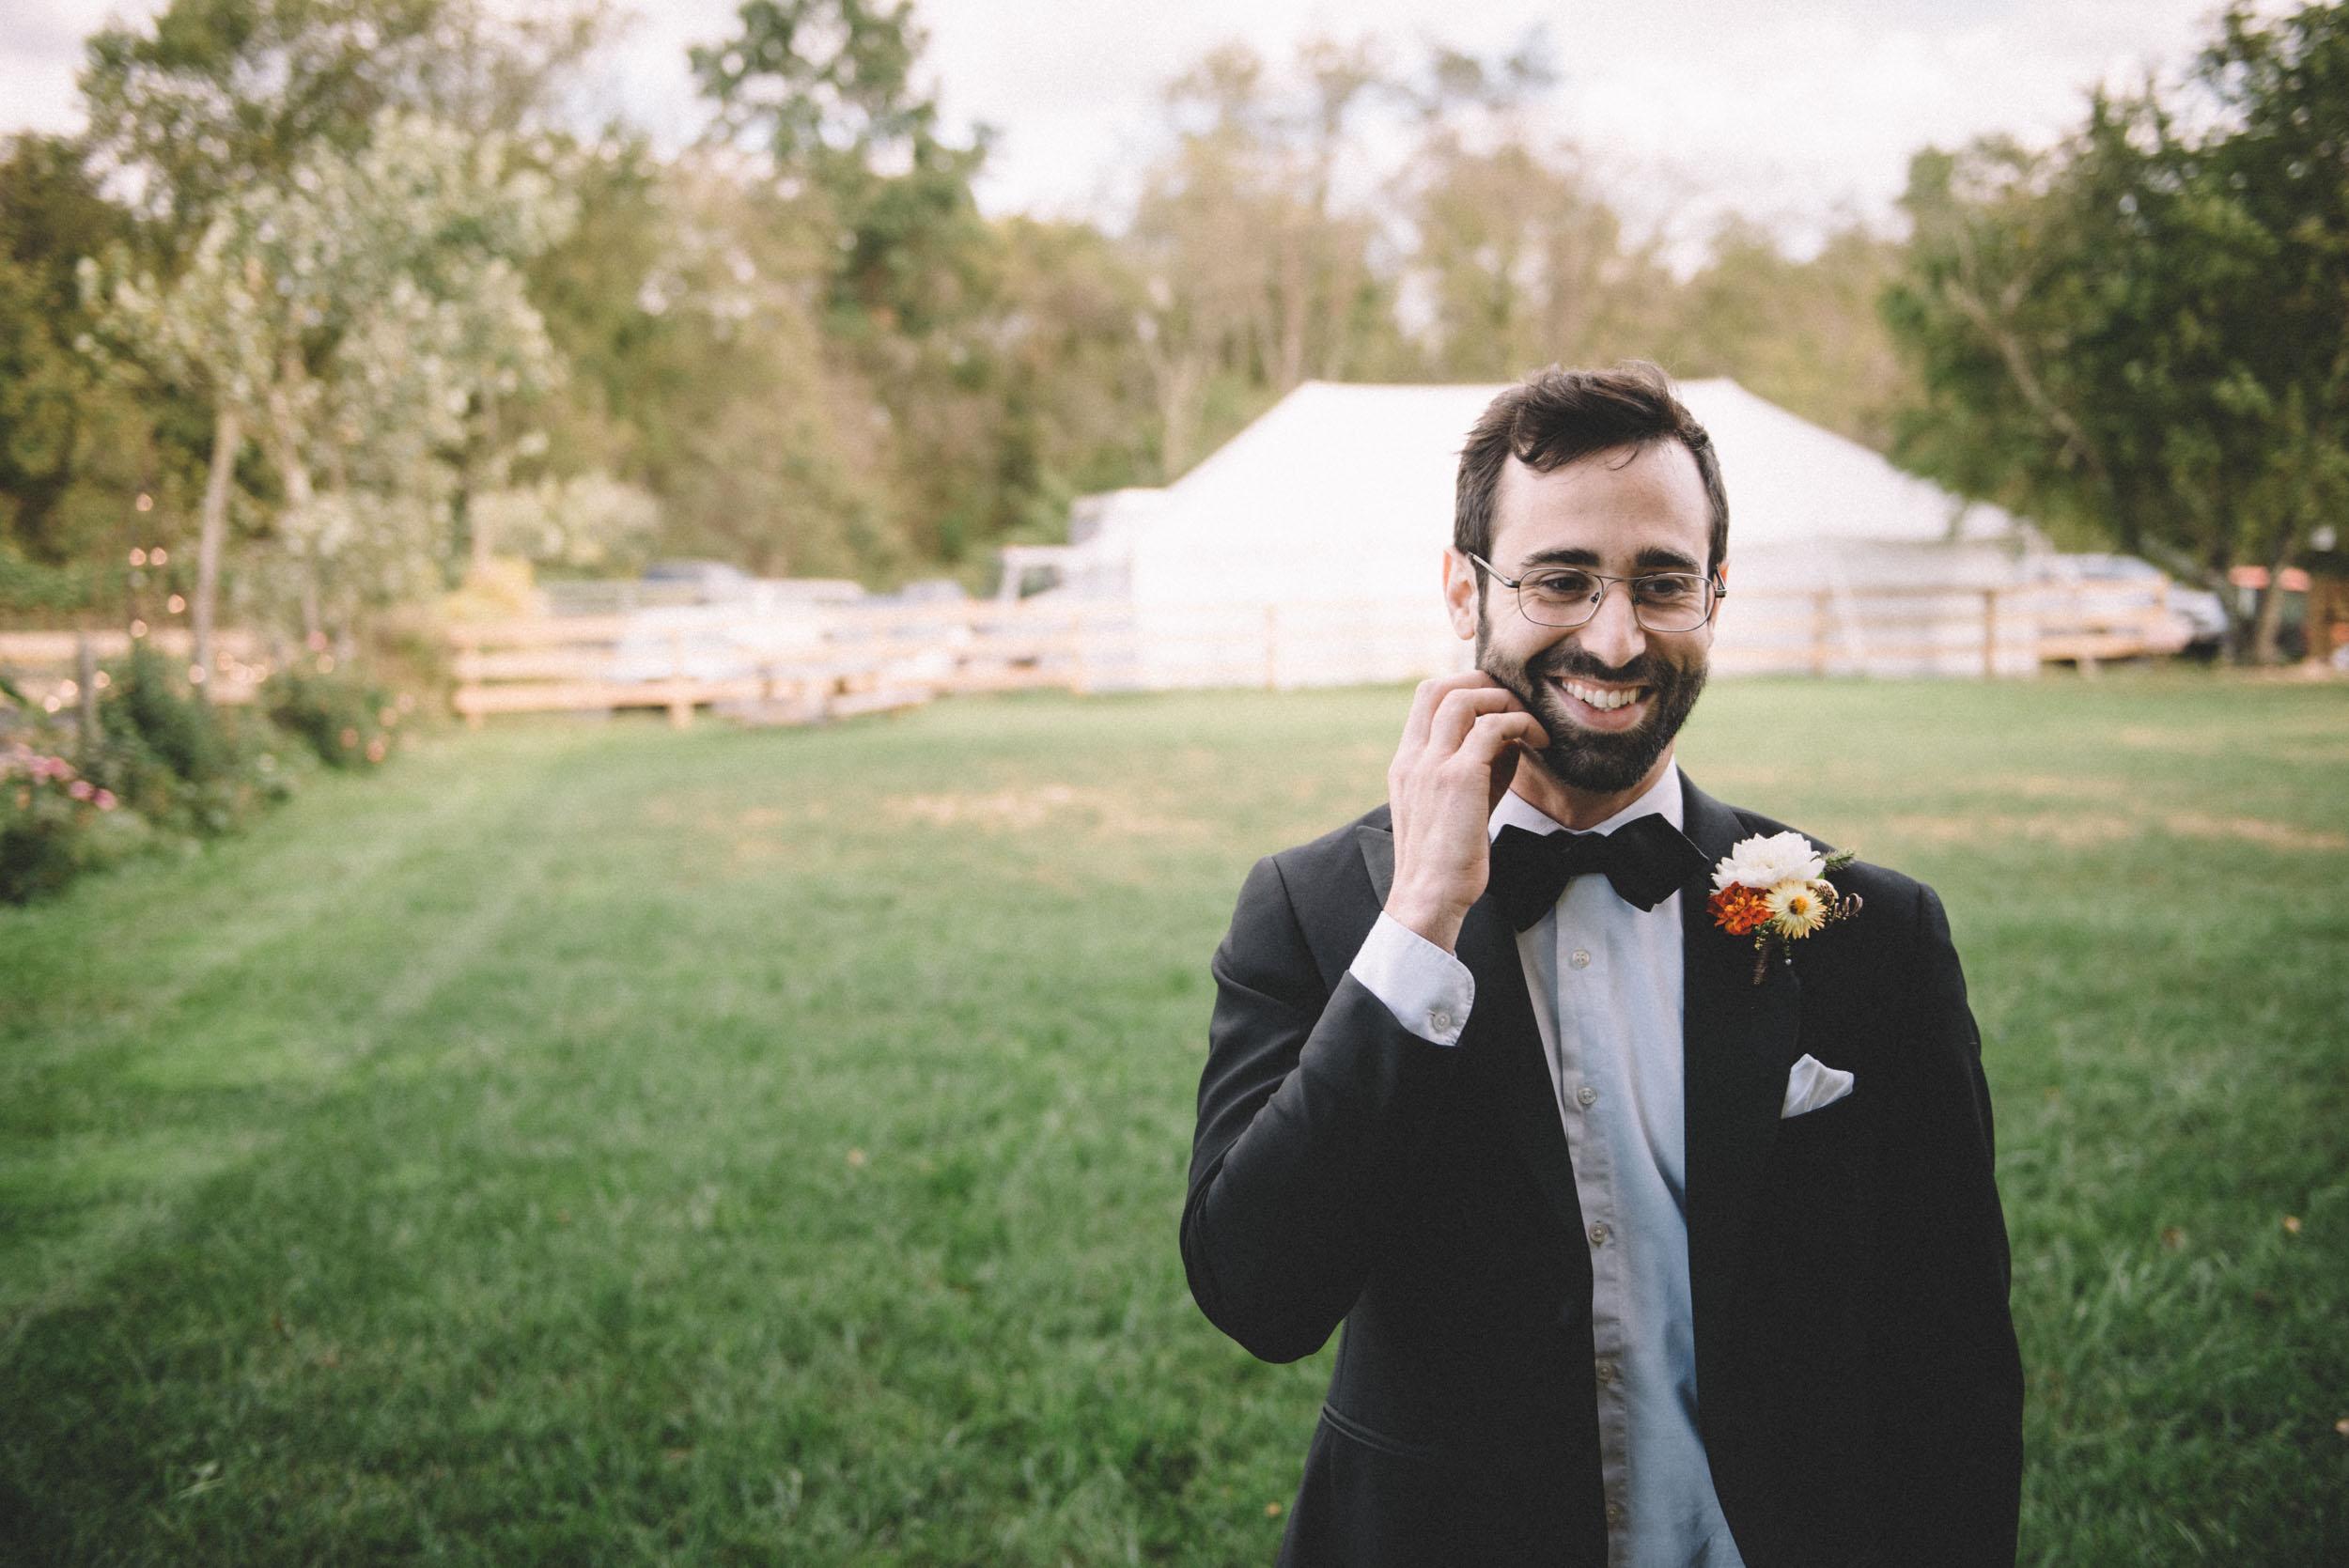 poolseville-maryland-wedding-photographer-4.jpg